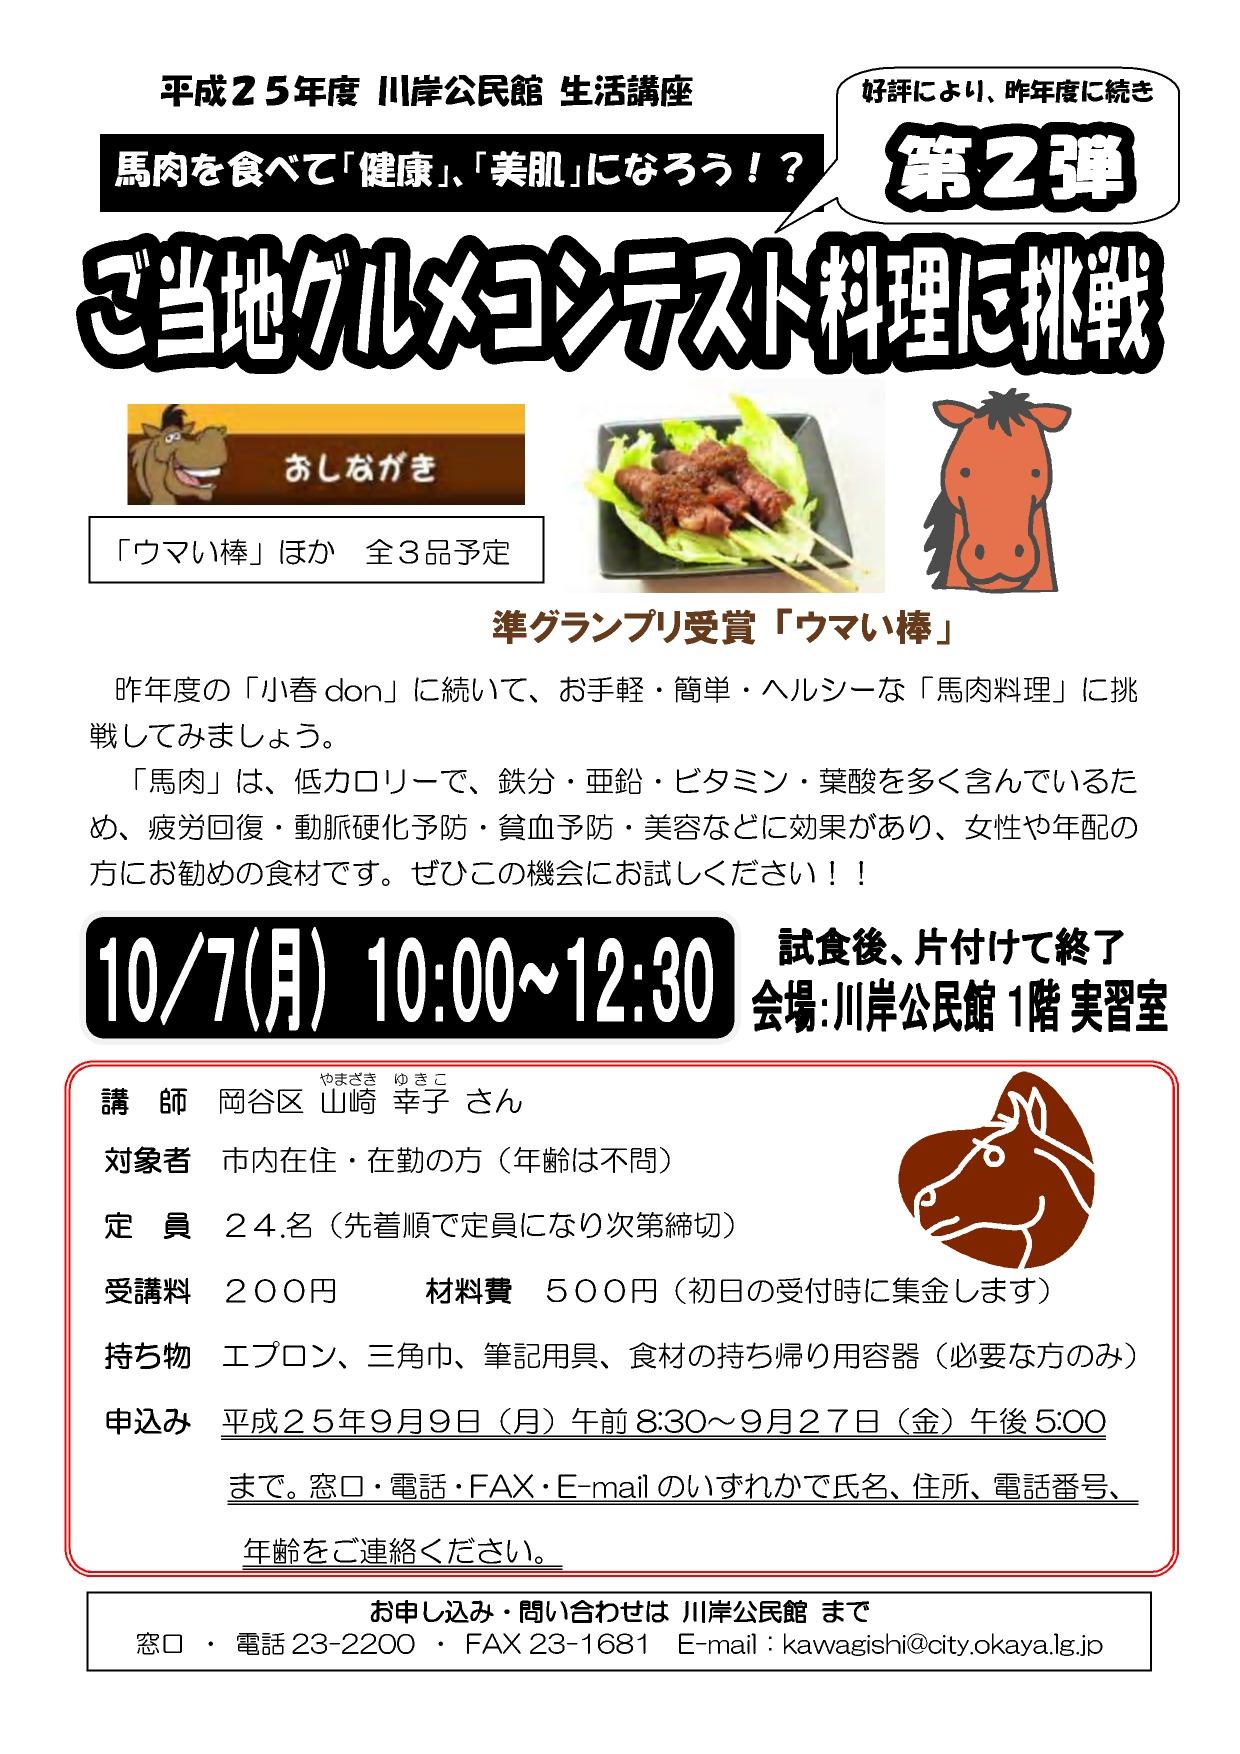 H25ご当地グルメコンテスト料理に挑戦 第2弾 チラシ(HP用).jpg